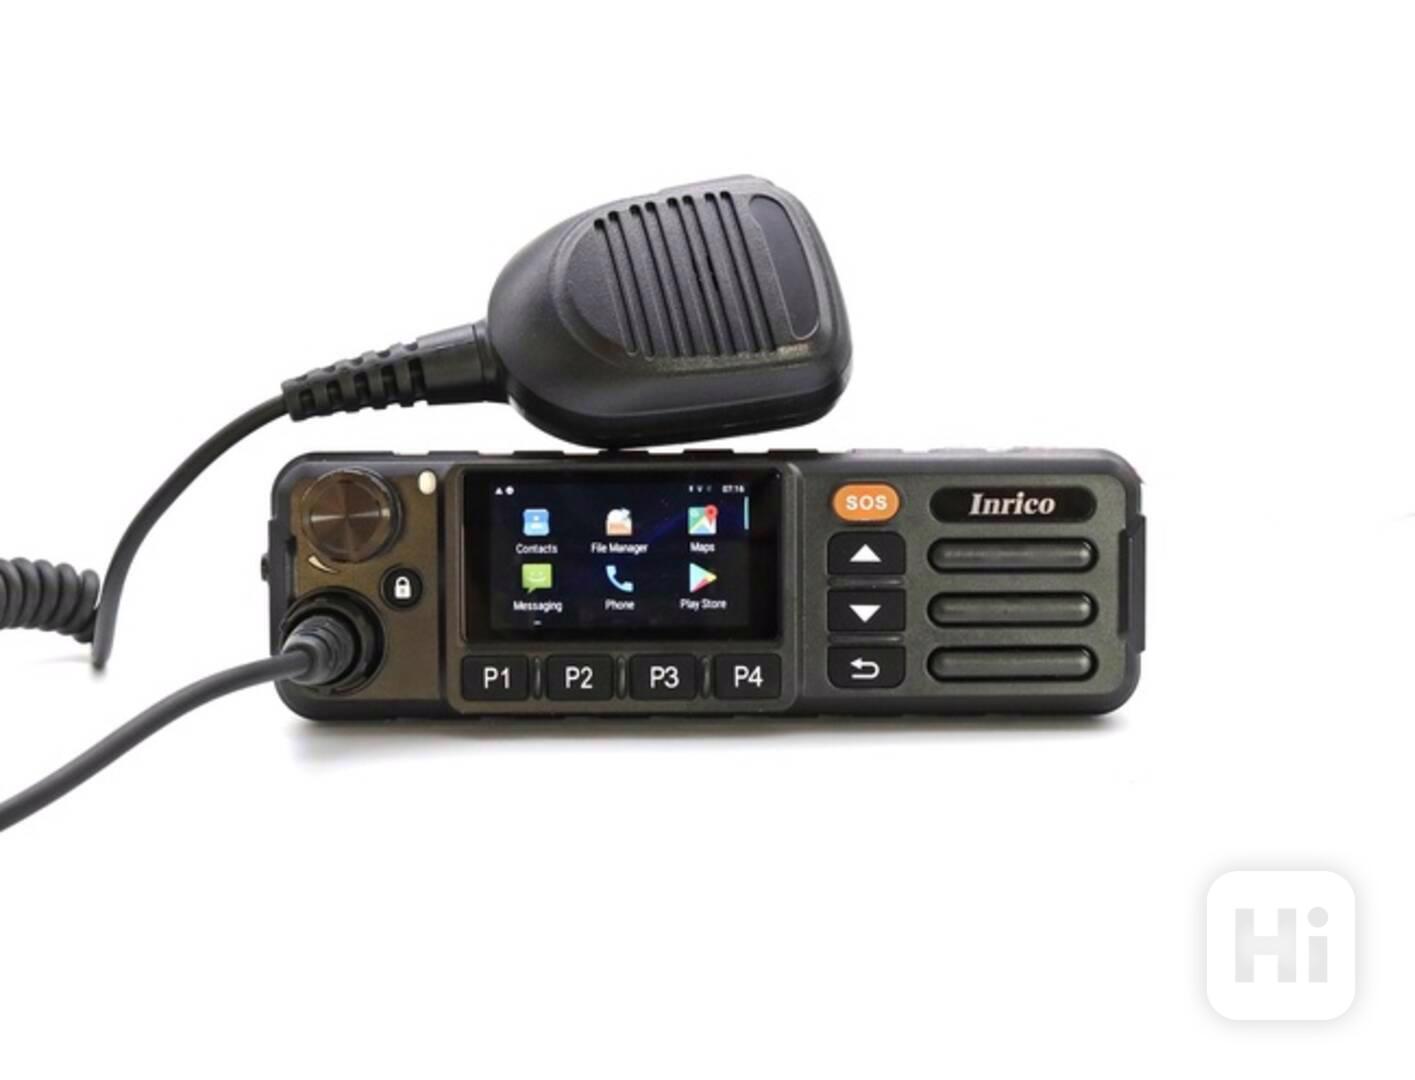 Vozidlová digitální radiostanice Inrico TM-7-PLUS LTE 4G - foto 1